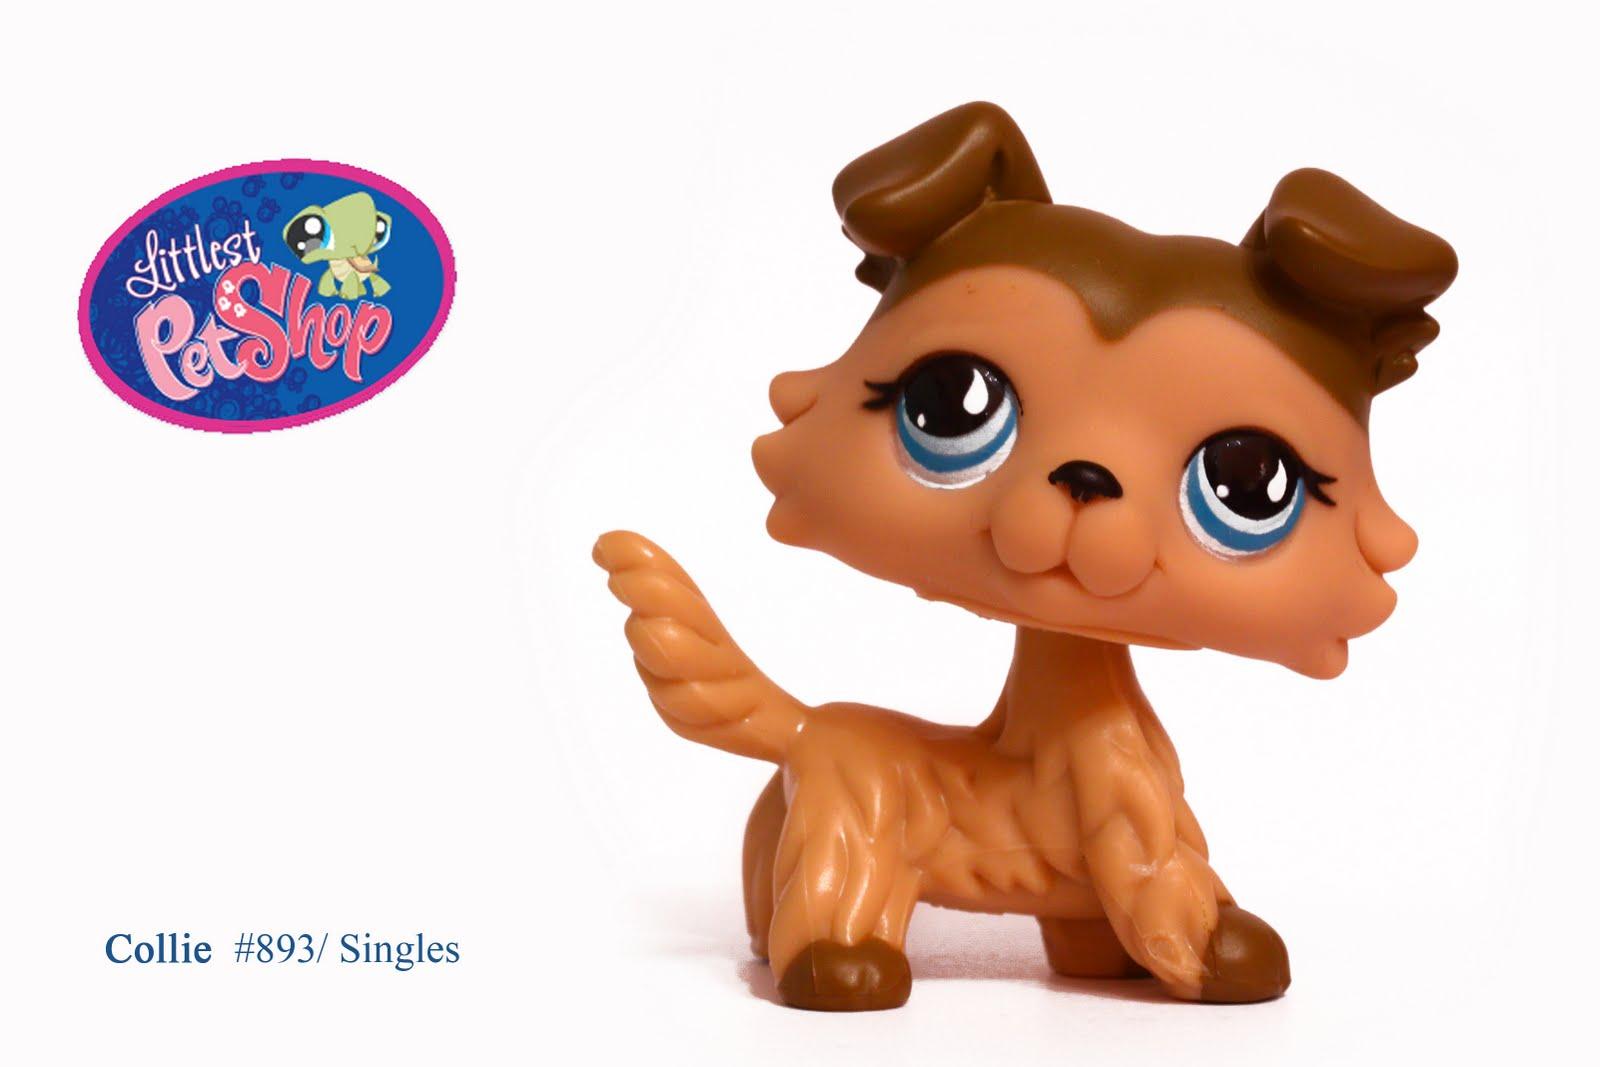 Littlest Pet Shop Collie Littlest Pet Shop Collie Con Los Littlest